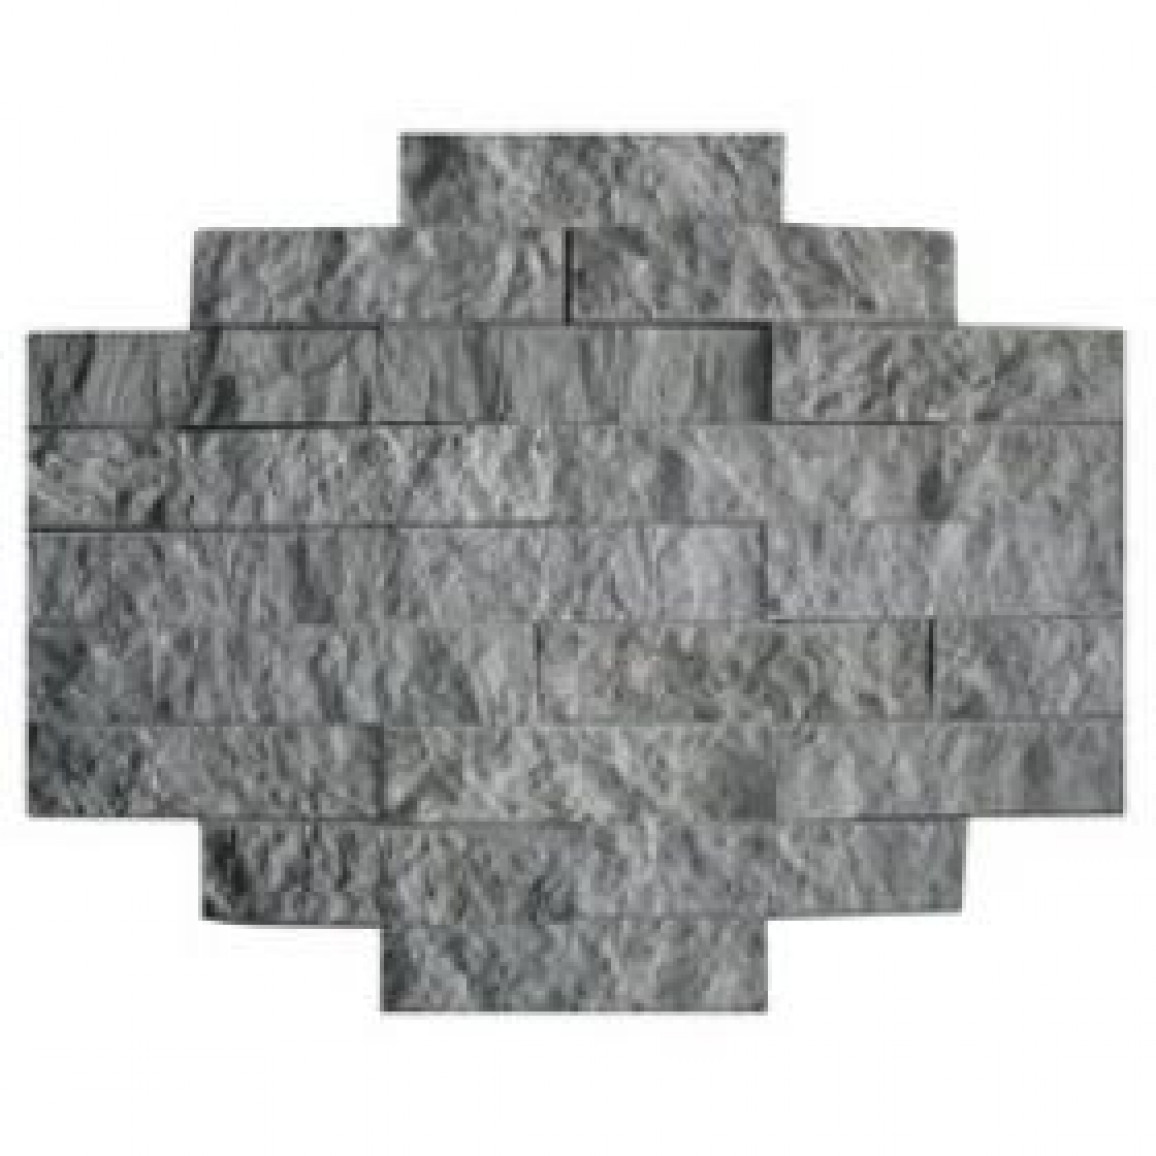 Рваный камень 100*50*20 мм